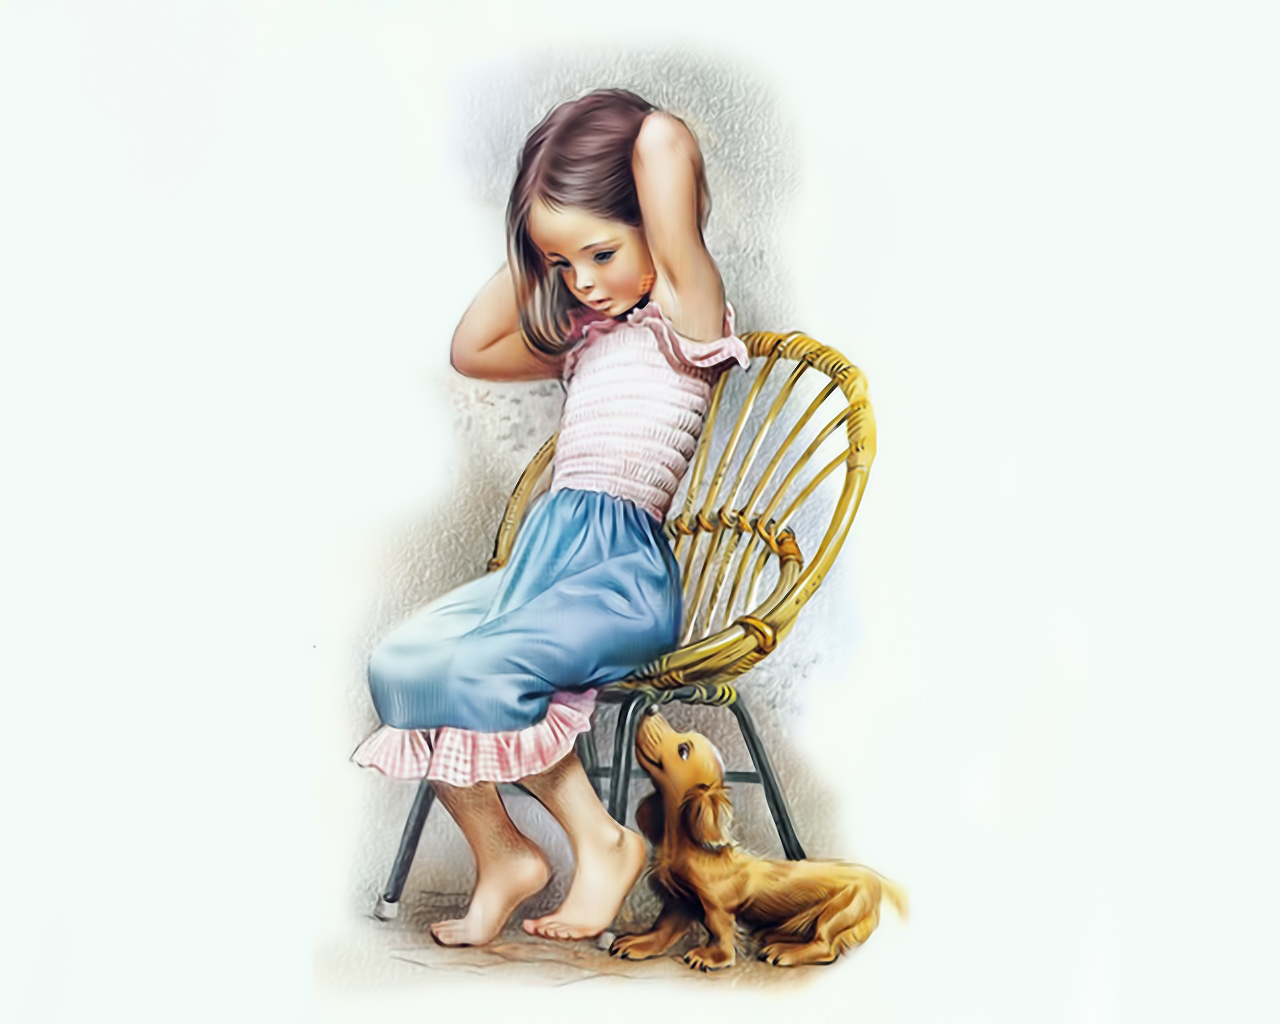 Touching hearts marcel marlier belgian artist and illustrator - Martine dessin ...